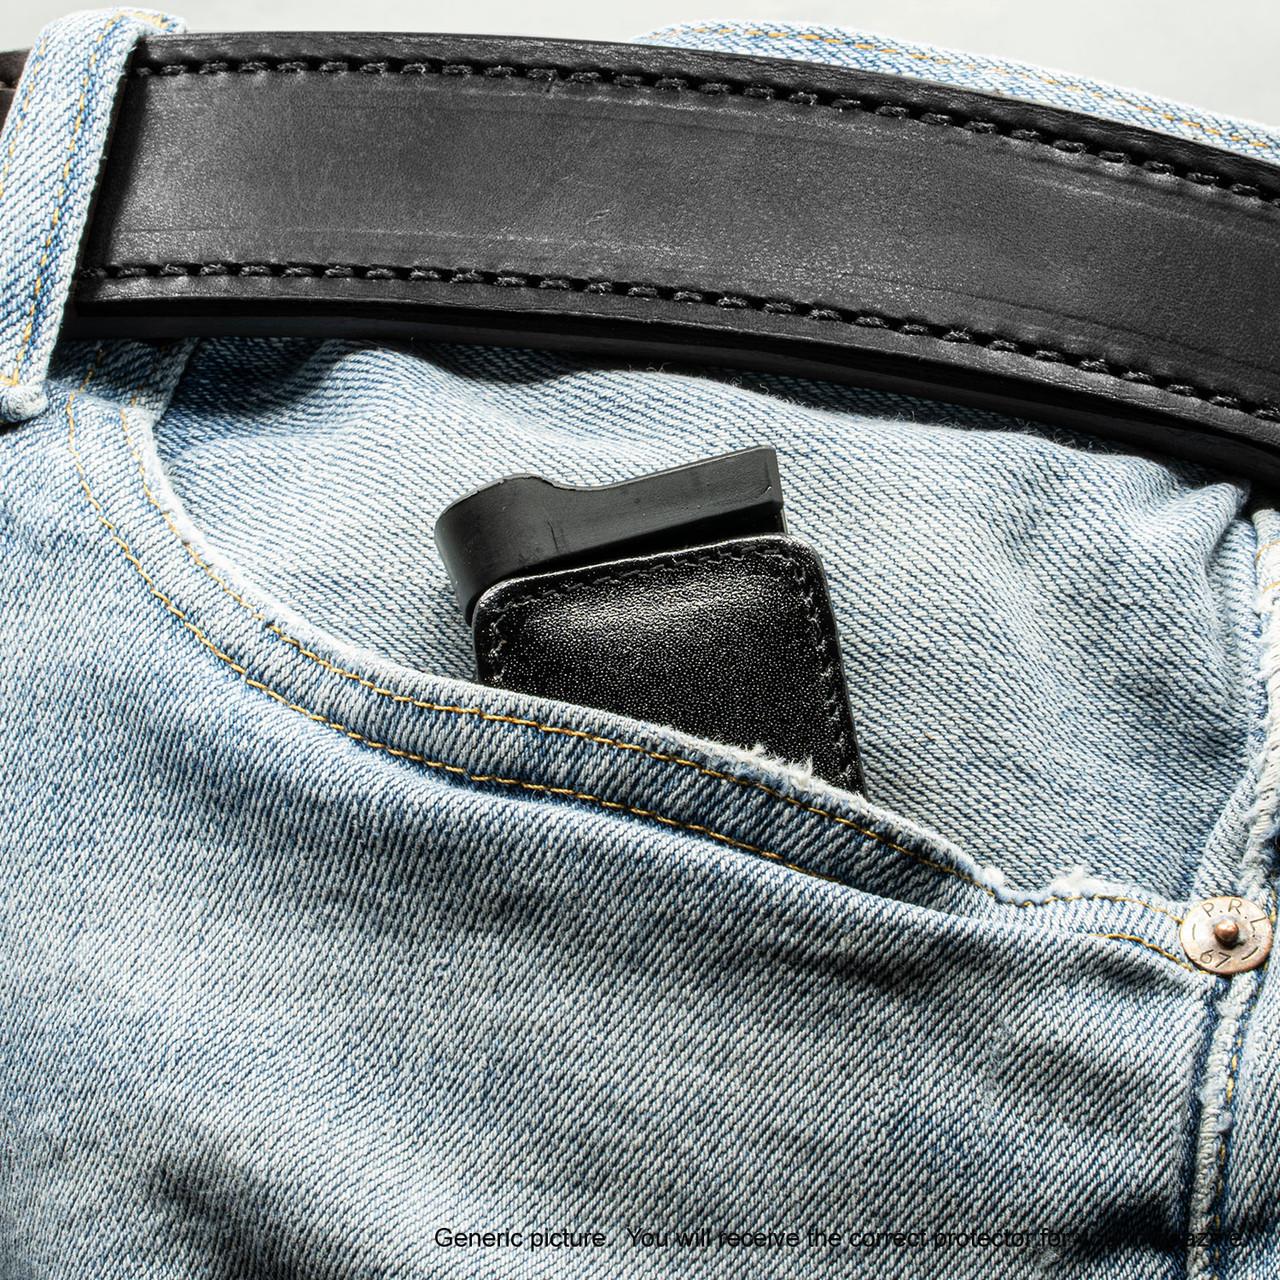 Kimber Micro CDP 9mm Black Leather Magazine Pocket Protector